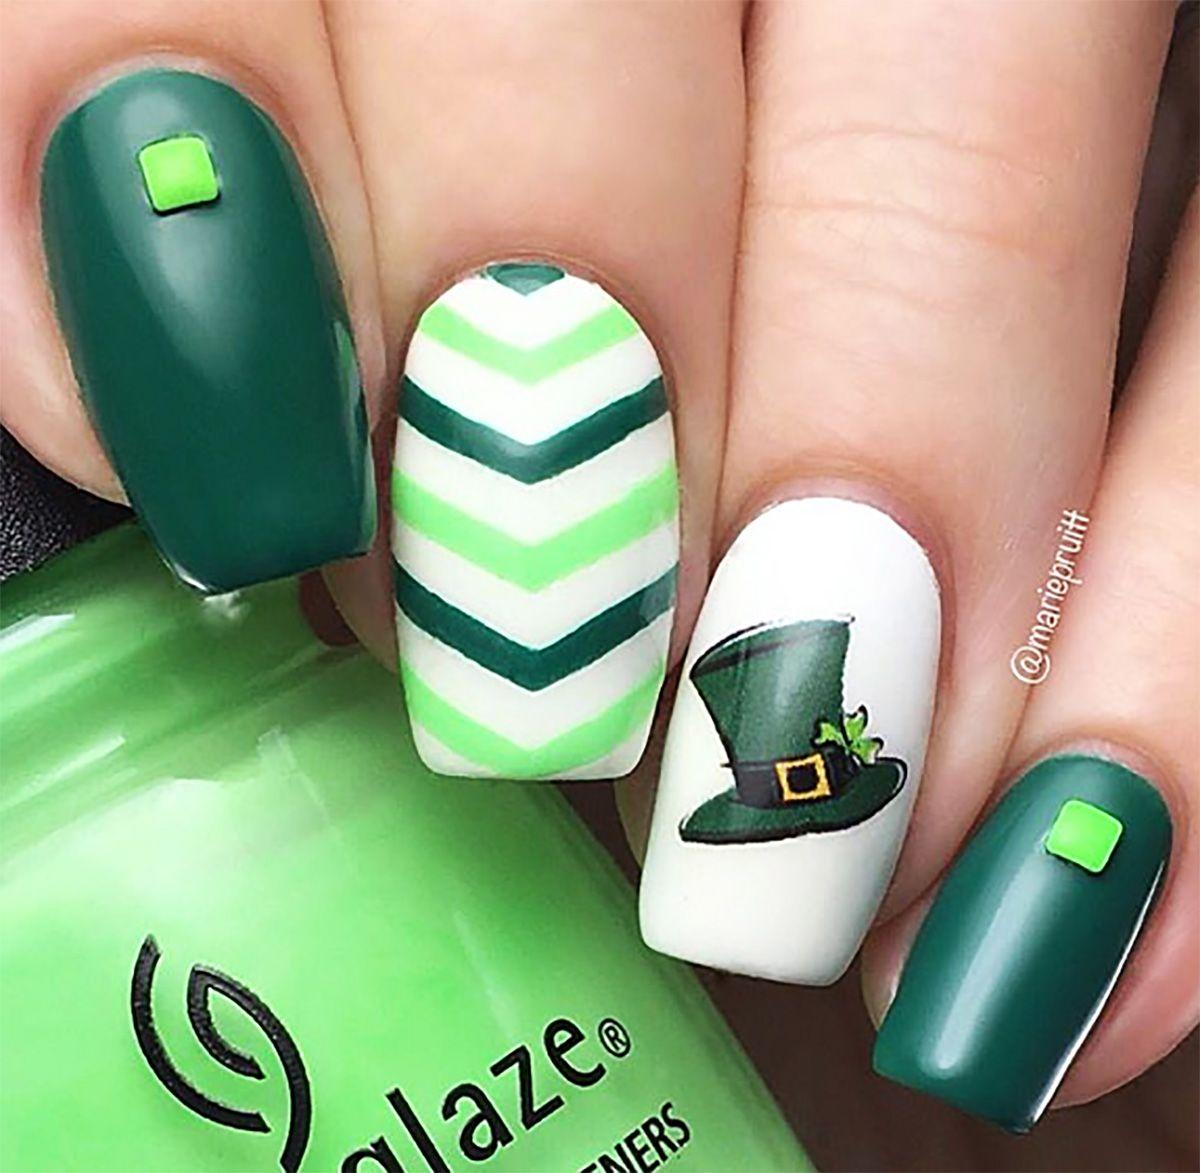 St. Patrick\'s Day Nail Art Decals #2 | Diseños de uñas